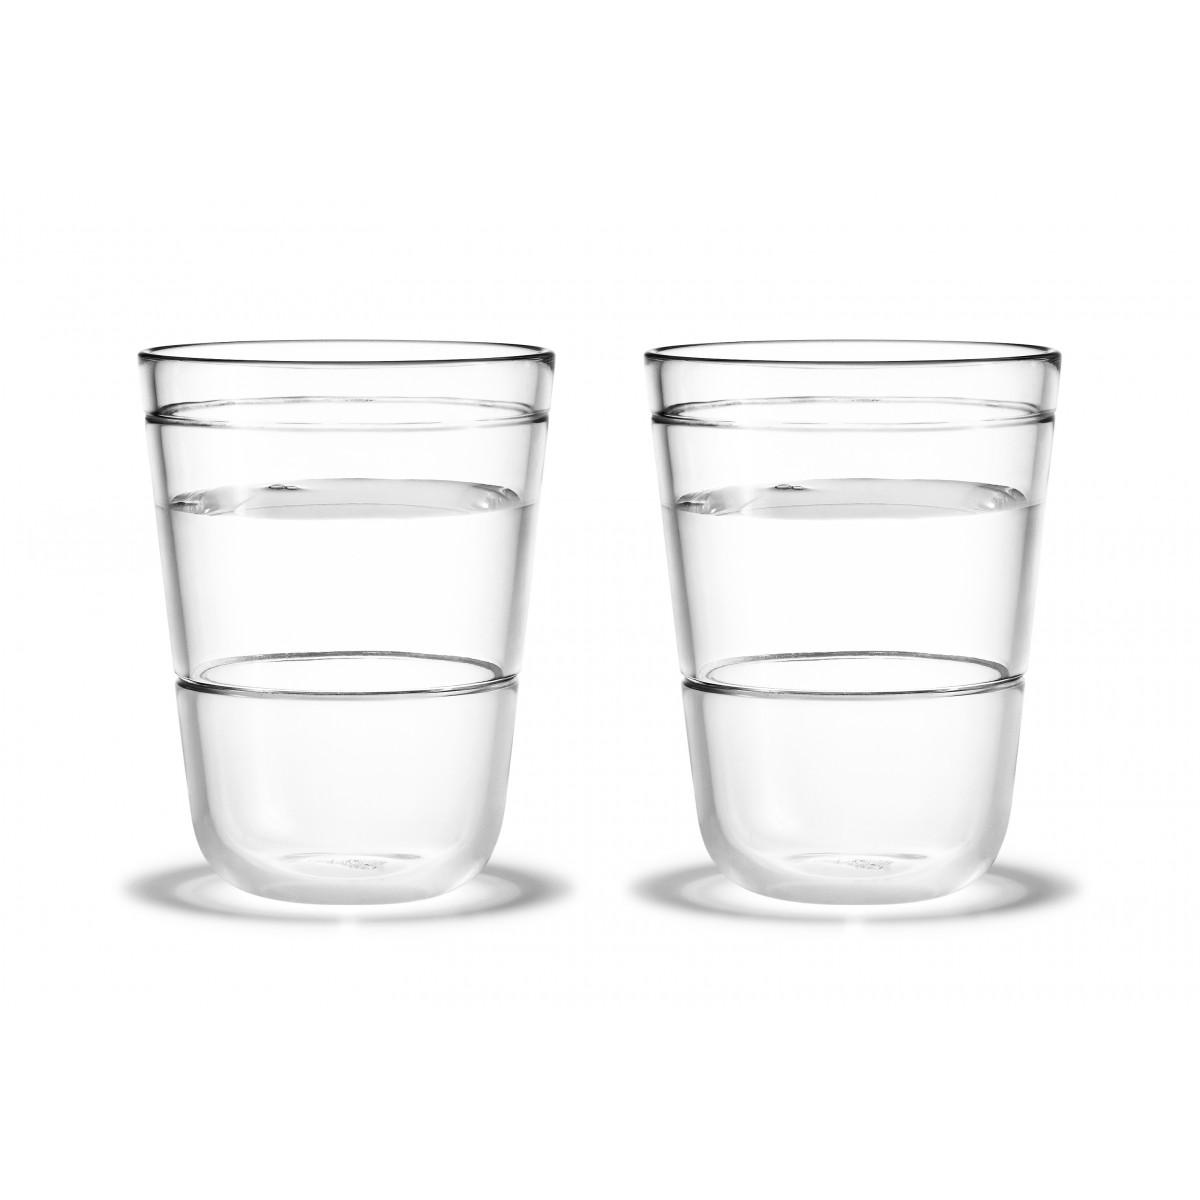 HOLMEGAARD Scala vandglas 30 cl - 2 stk